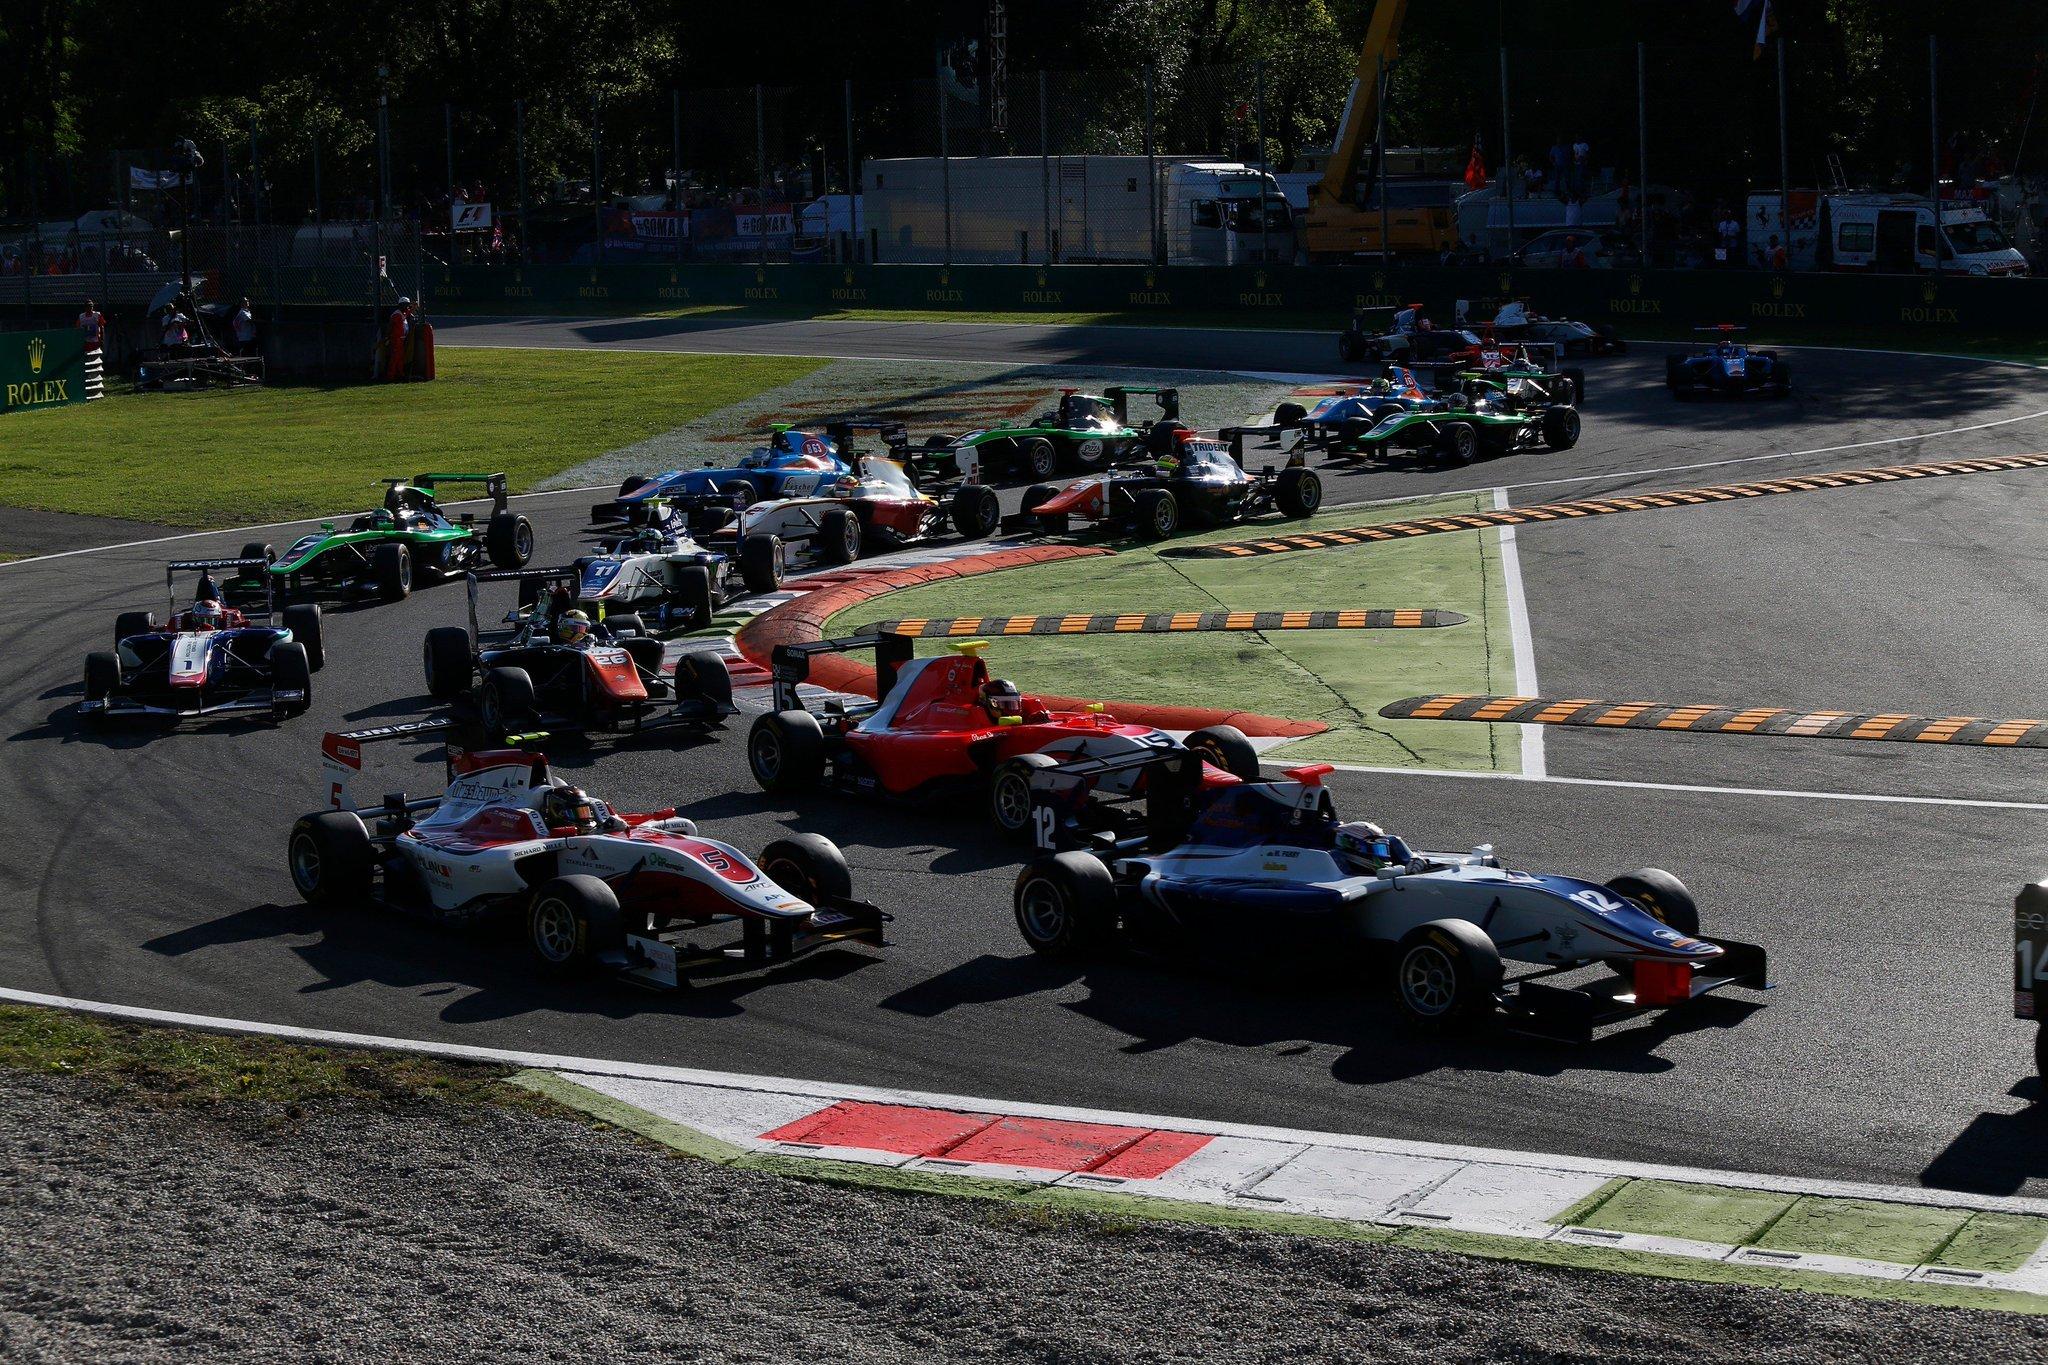 GP3 DRS Coming in 2017 to Formula Car Series